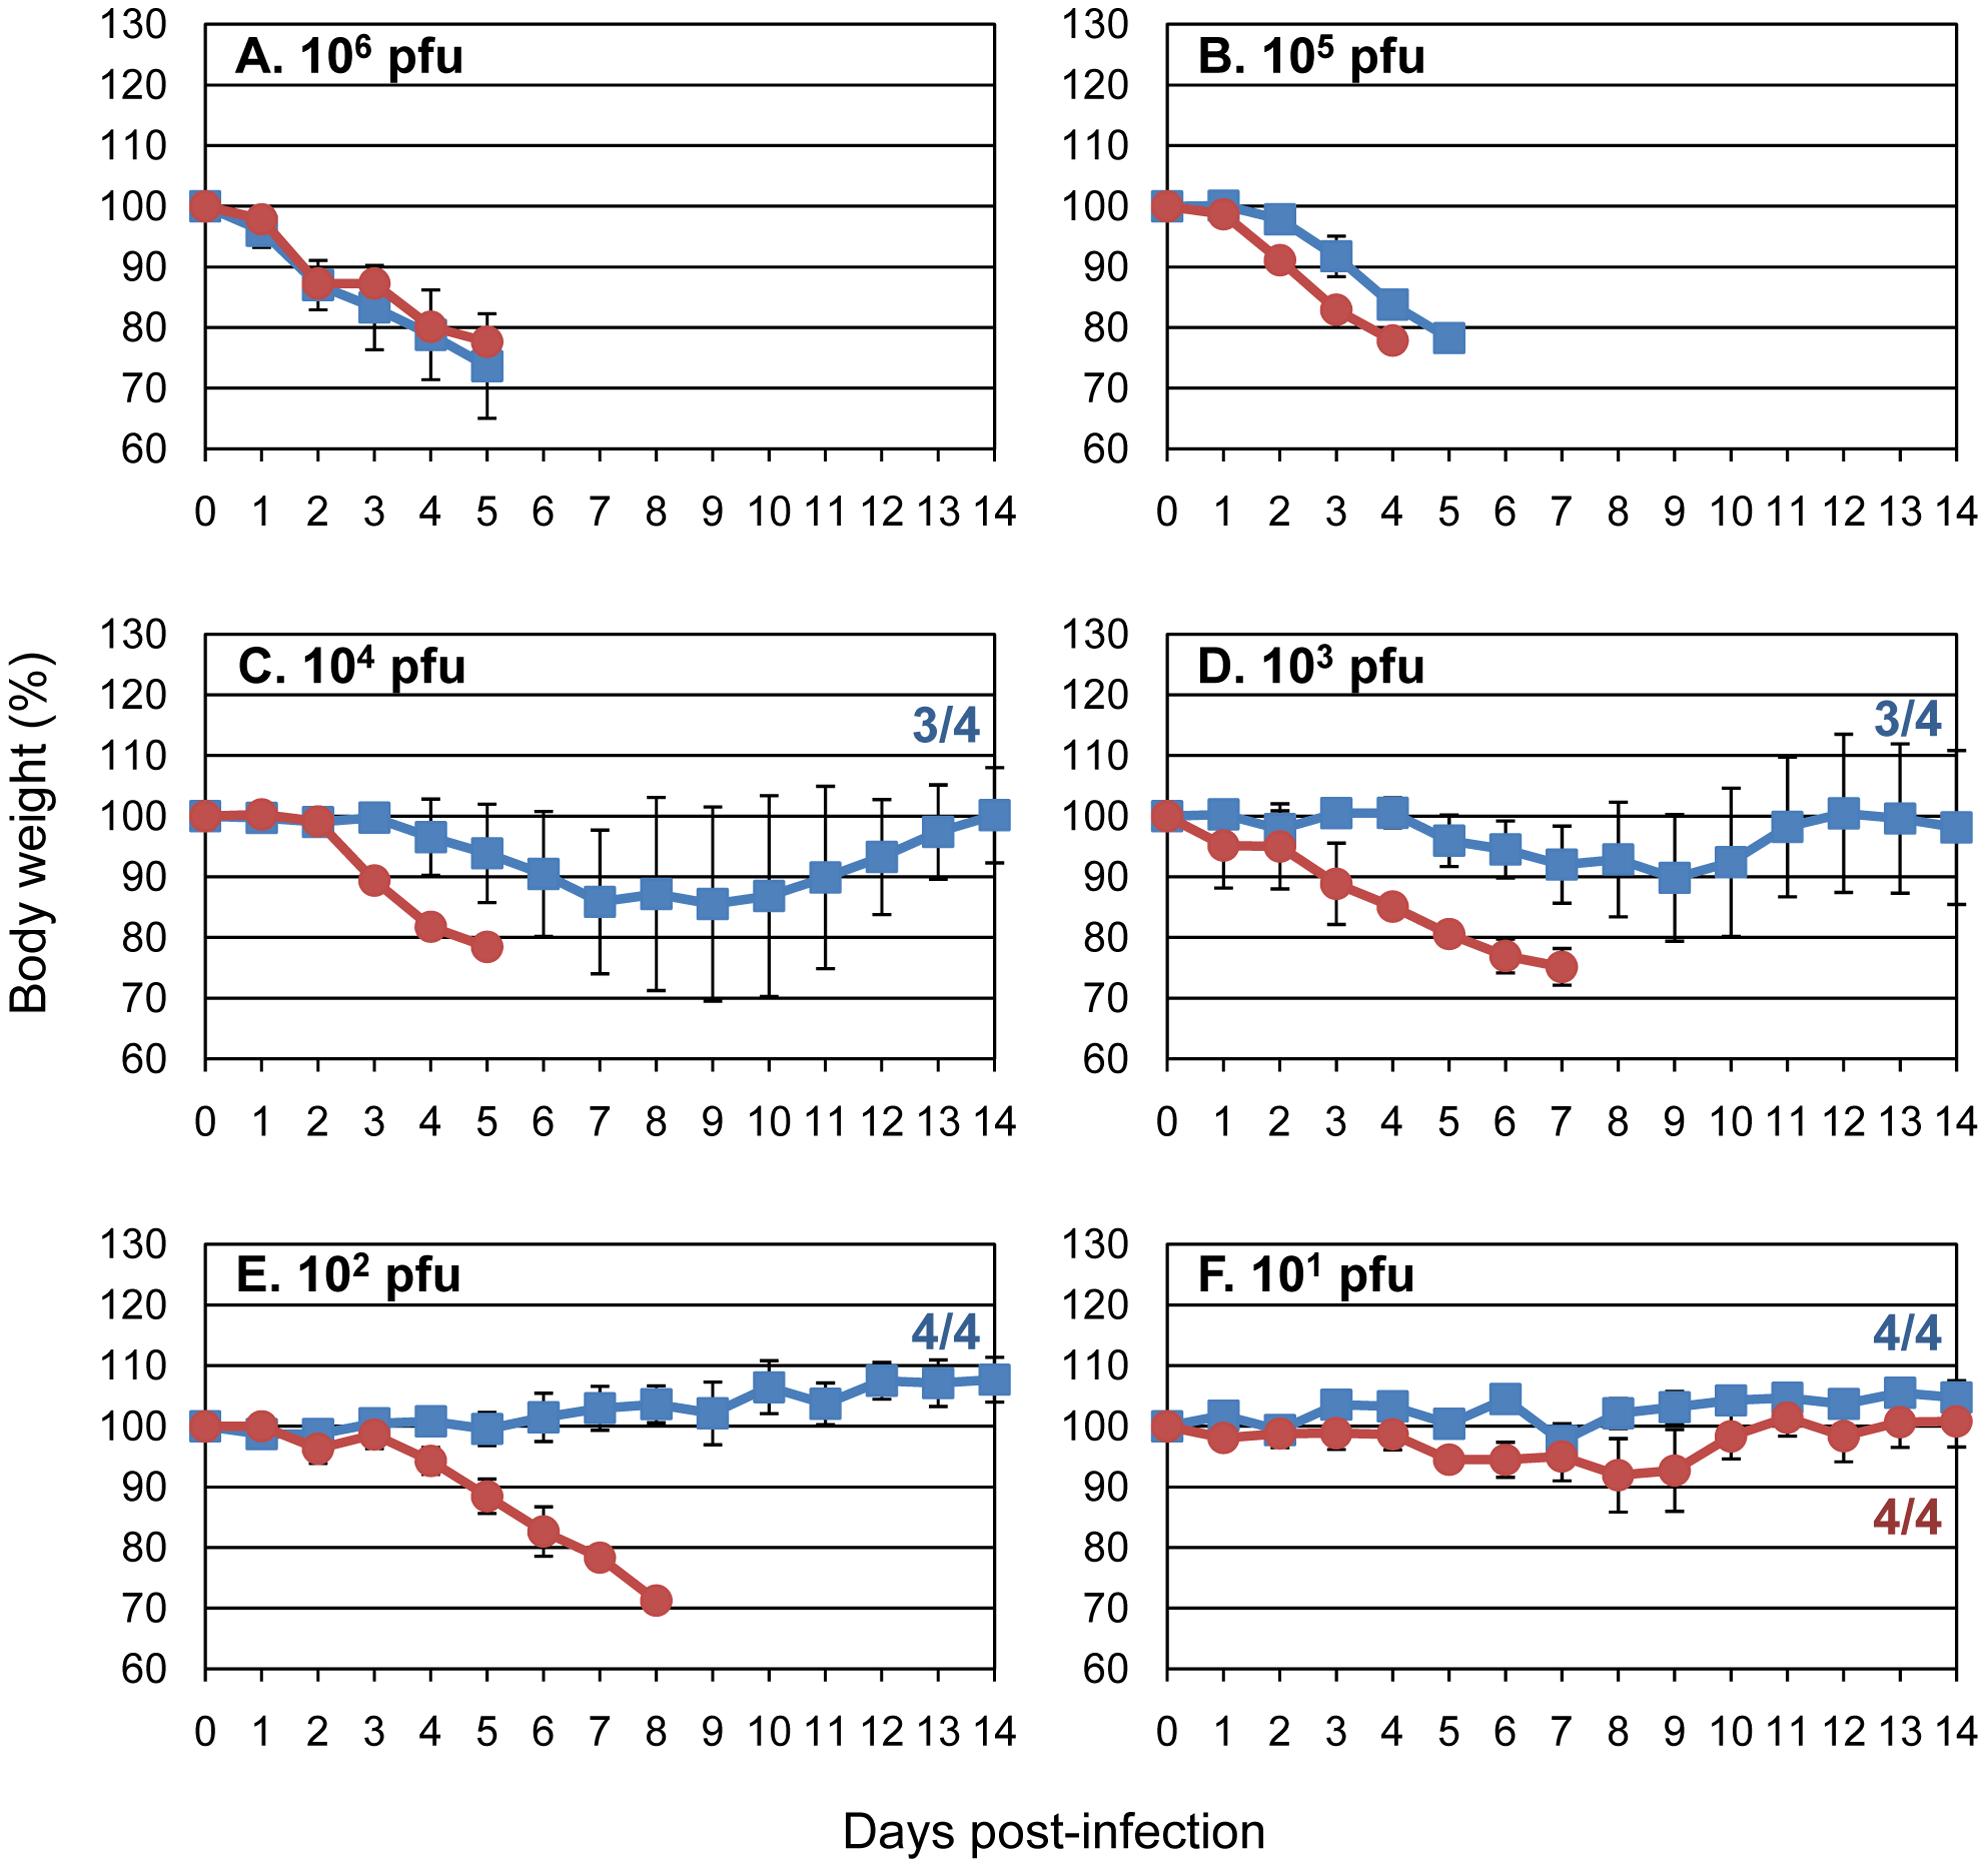 Amino acid PB2-591K increases the virulence of an avian H5N1 virus in mice.